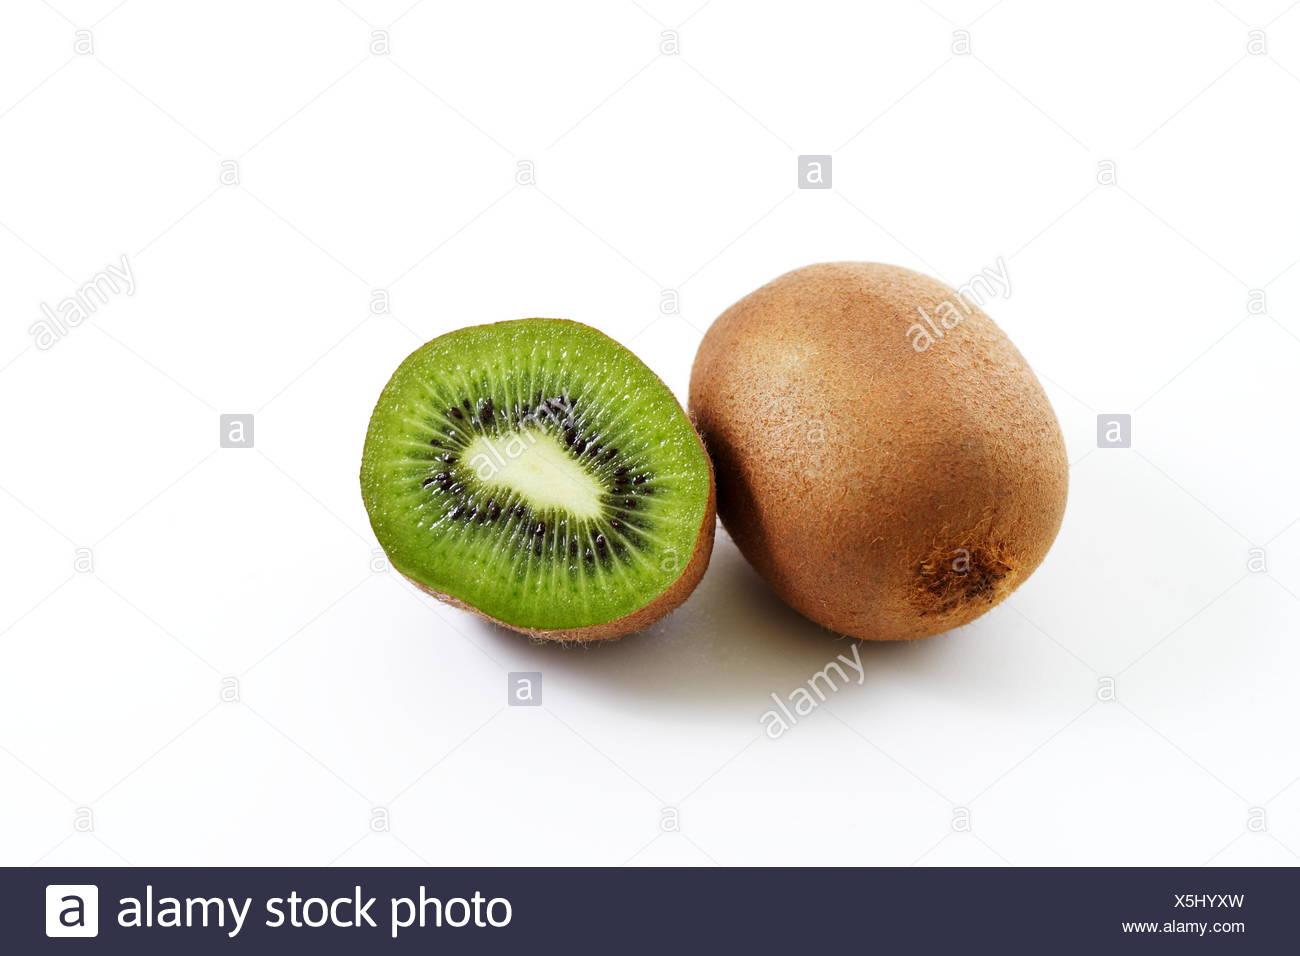 Kiwi - Kiwi Stockbild